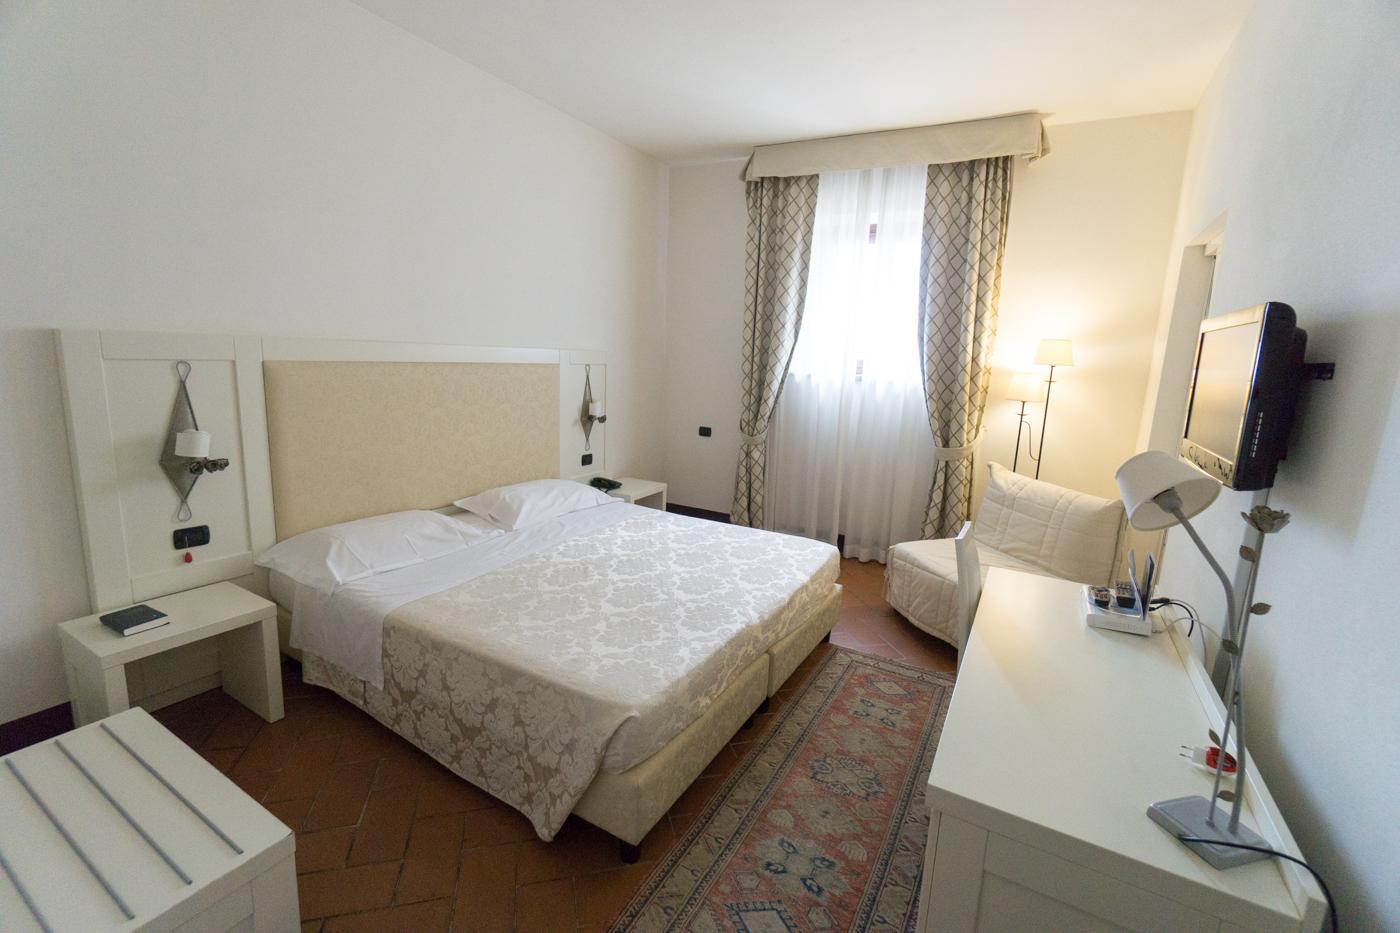 Hotel San Miniato - ville de la truffe